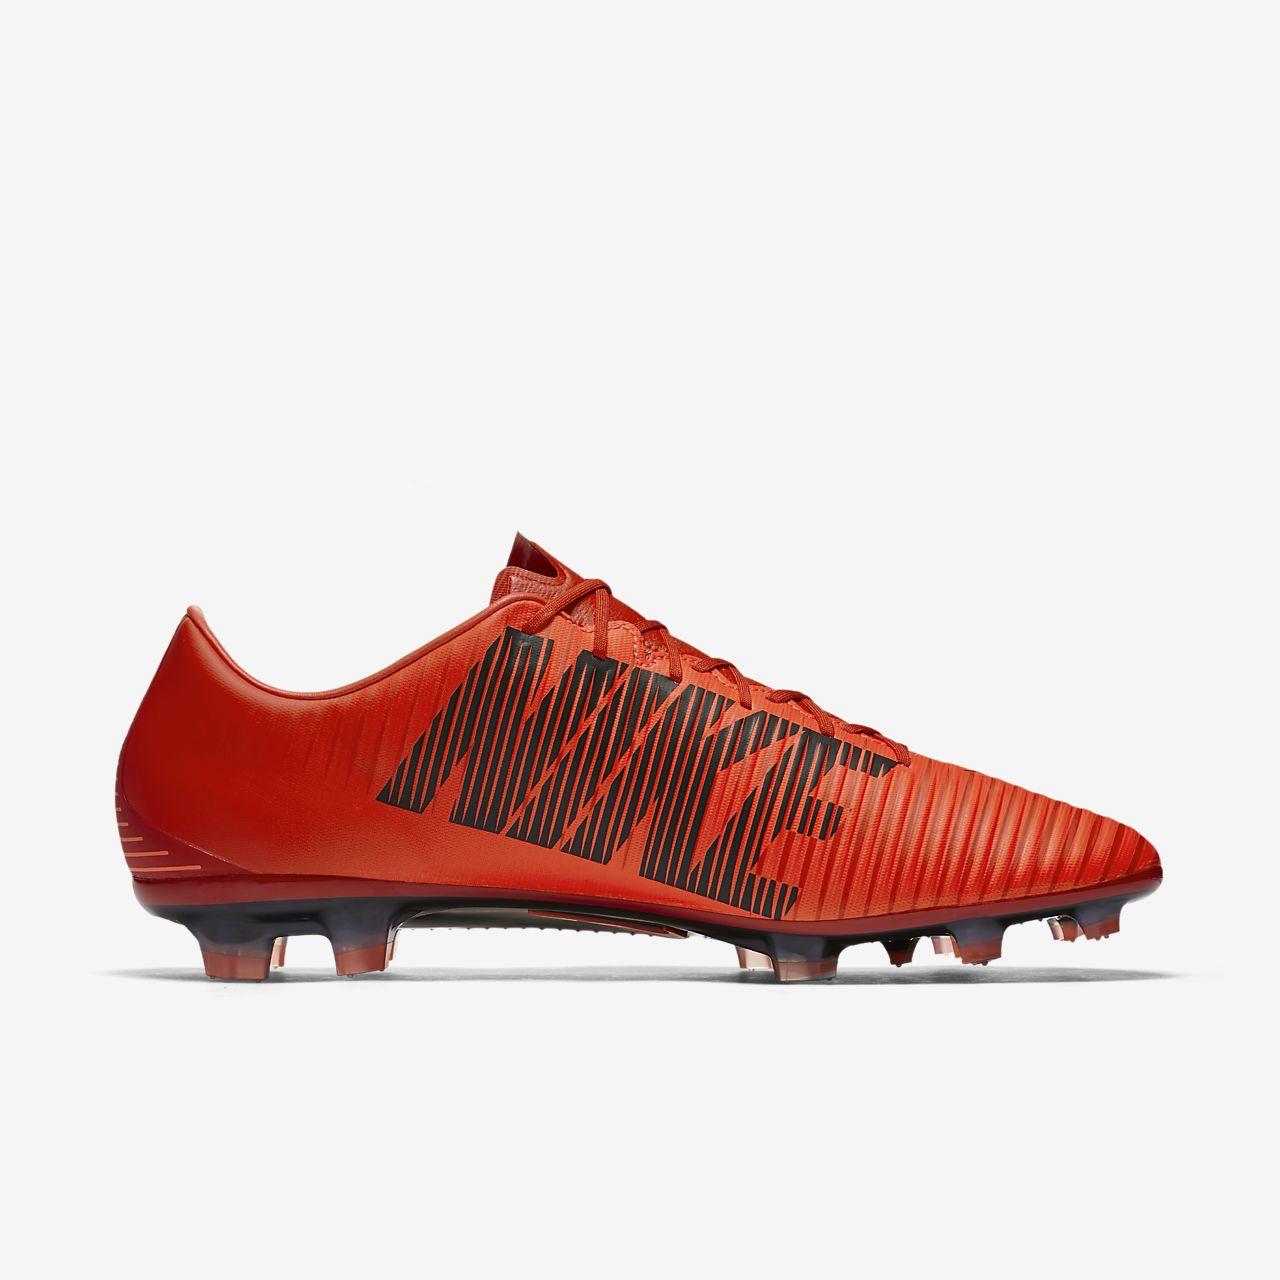 ... Nike Mercurial Veloce III Firm-Ground Football Boot